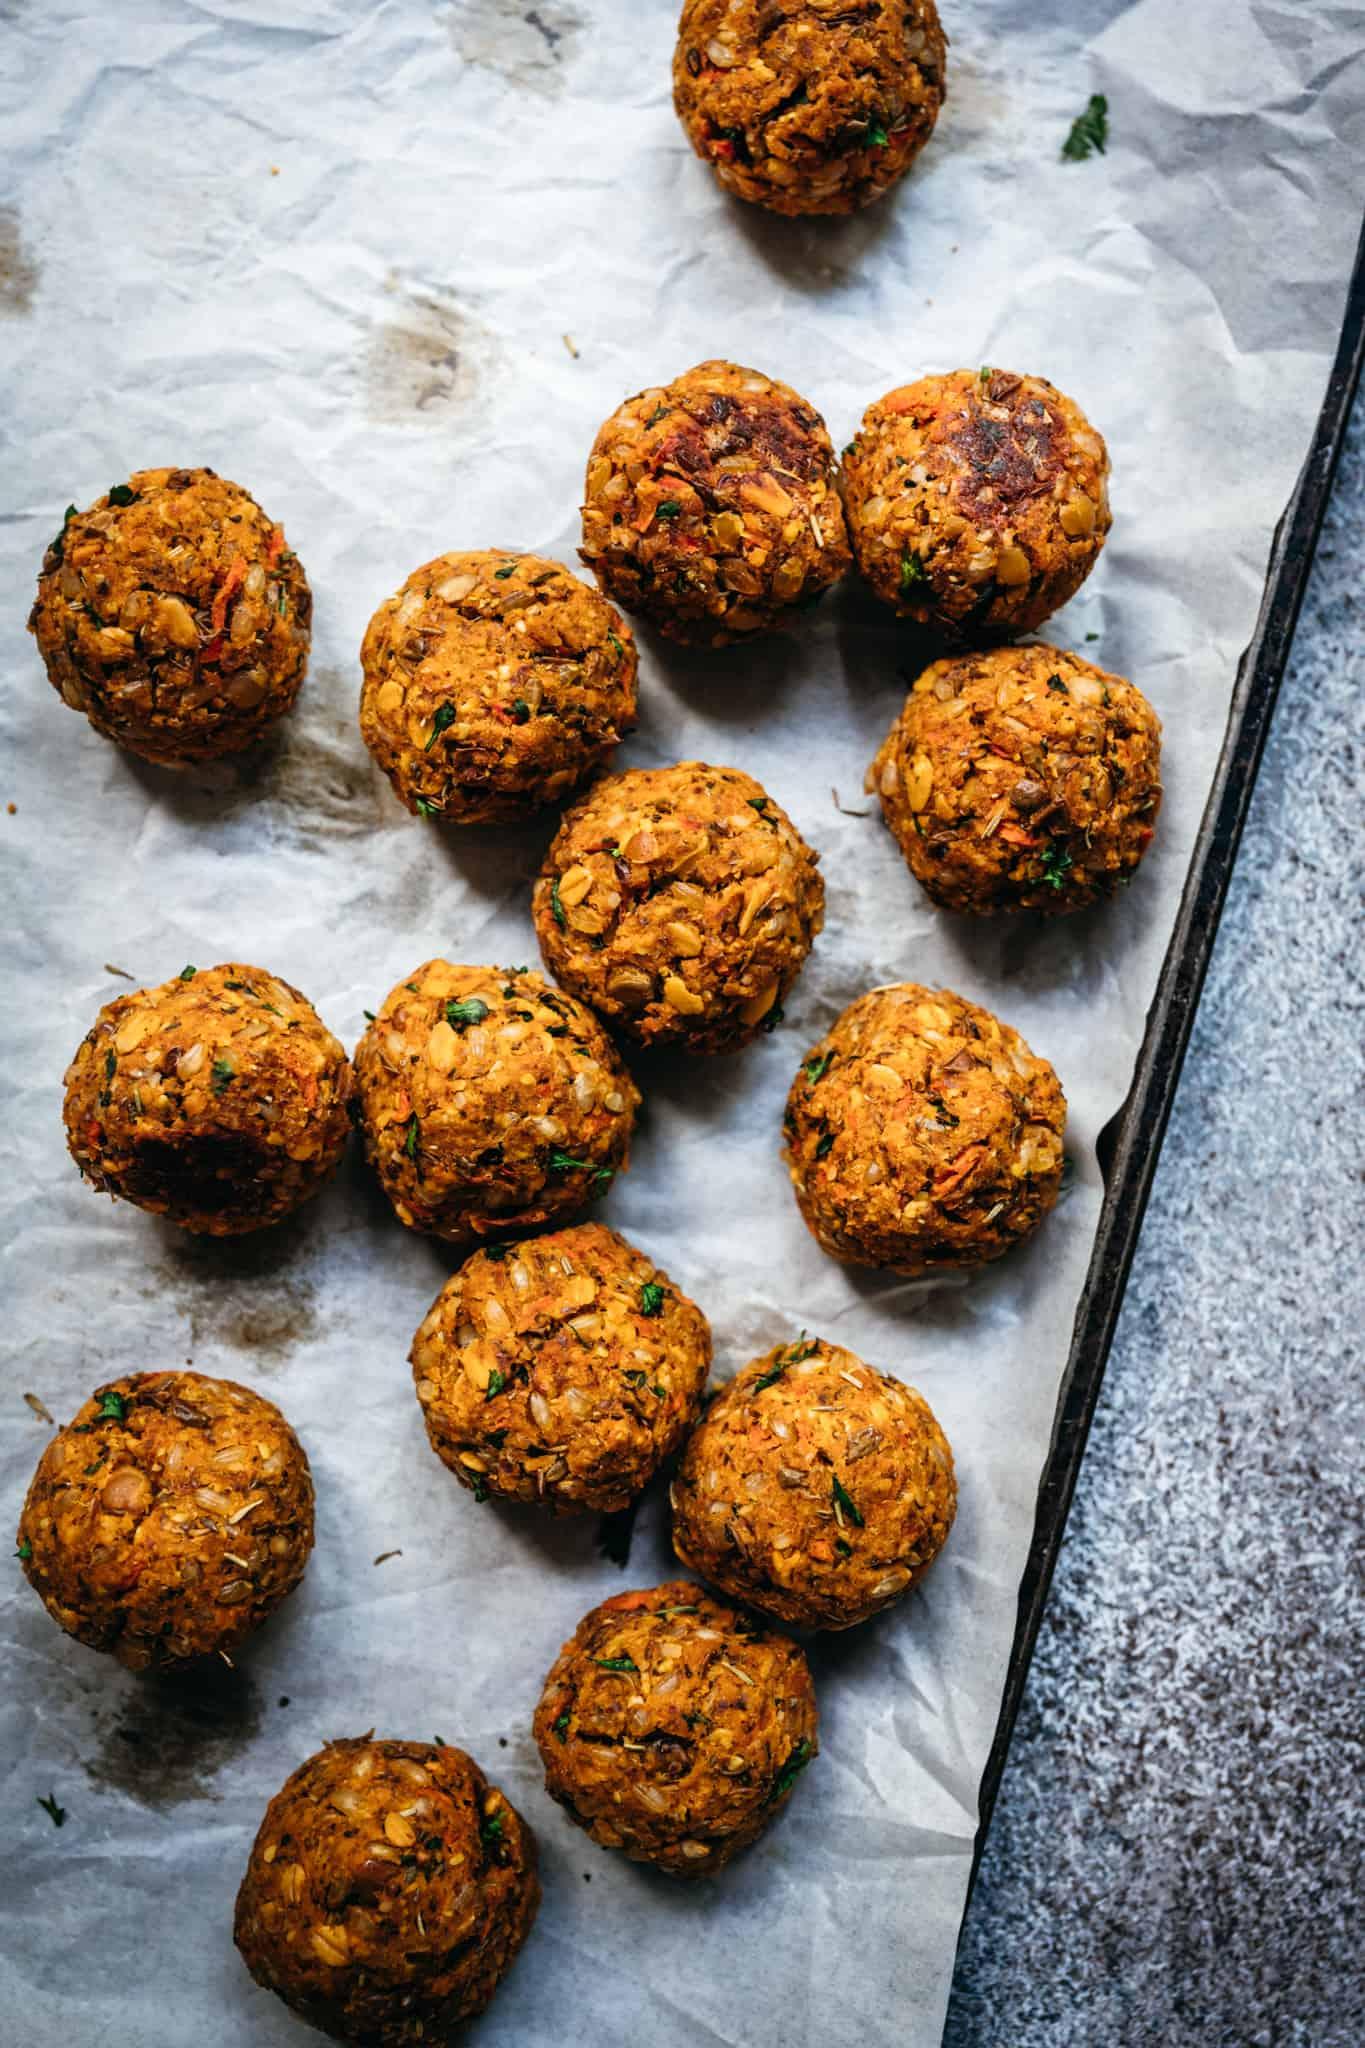 overhead view of homemade vegan lentil meatballs on sheet pan